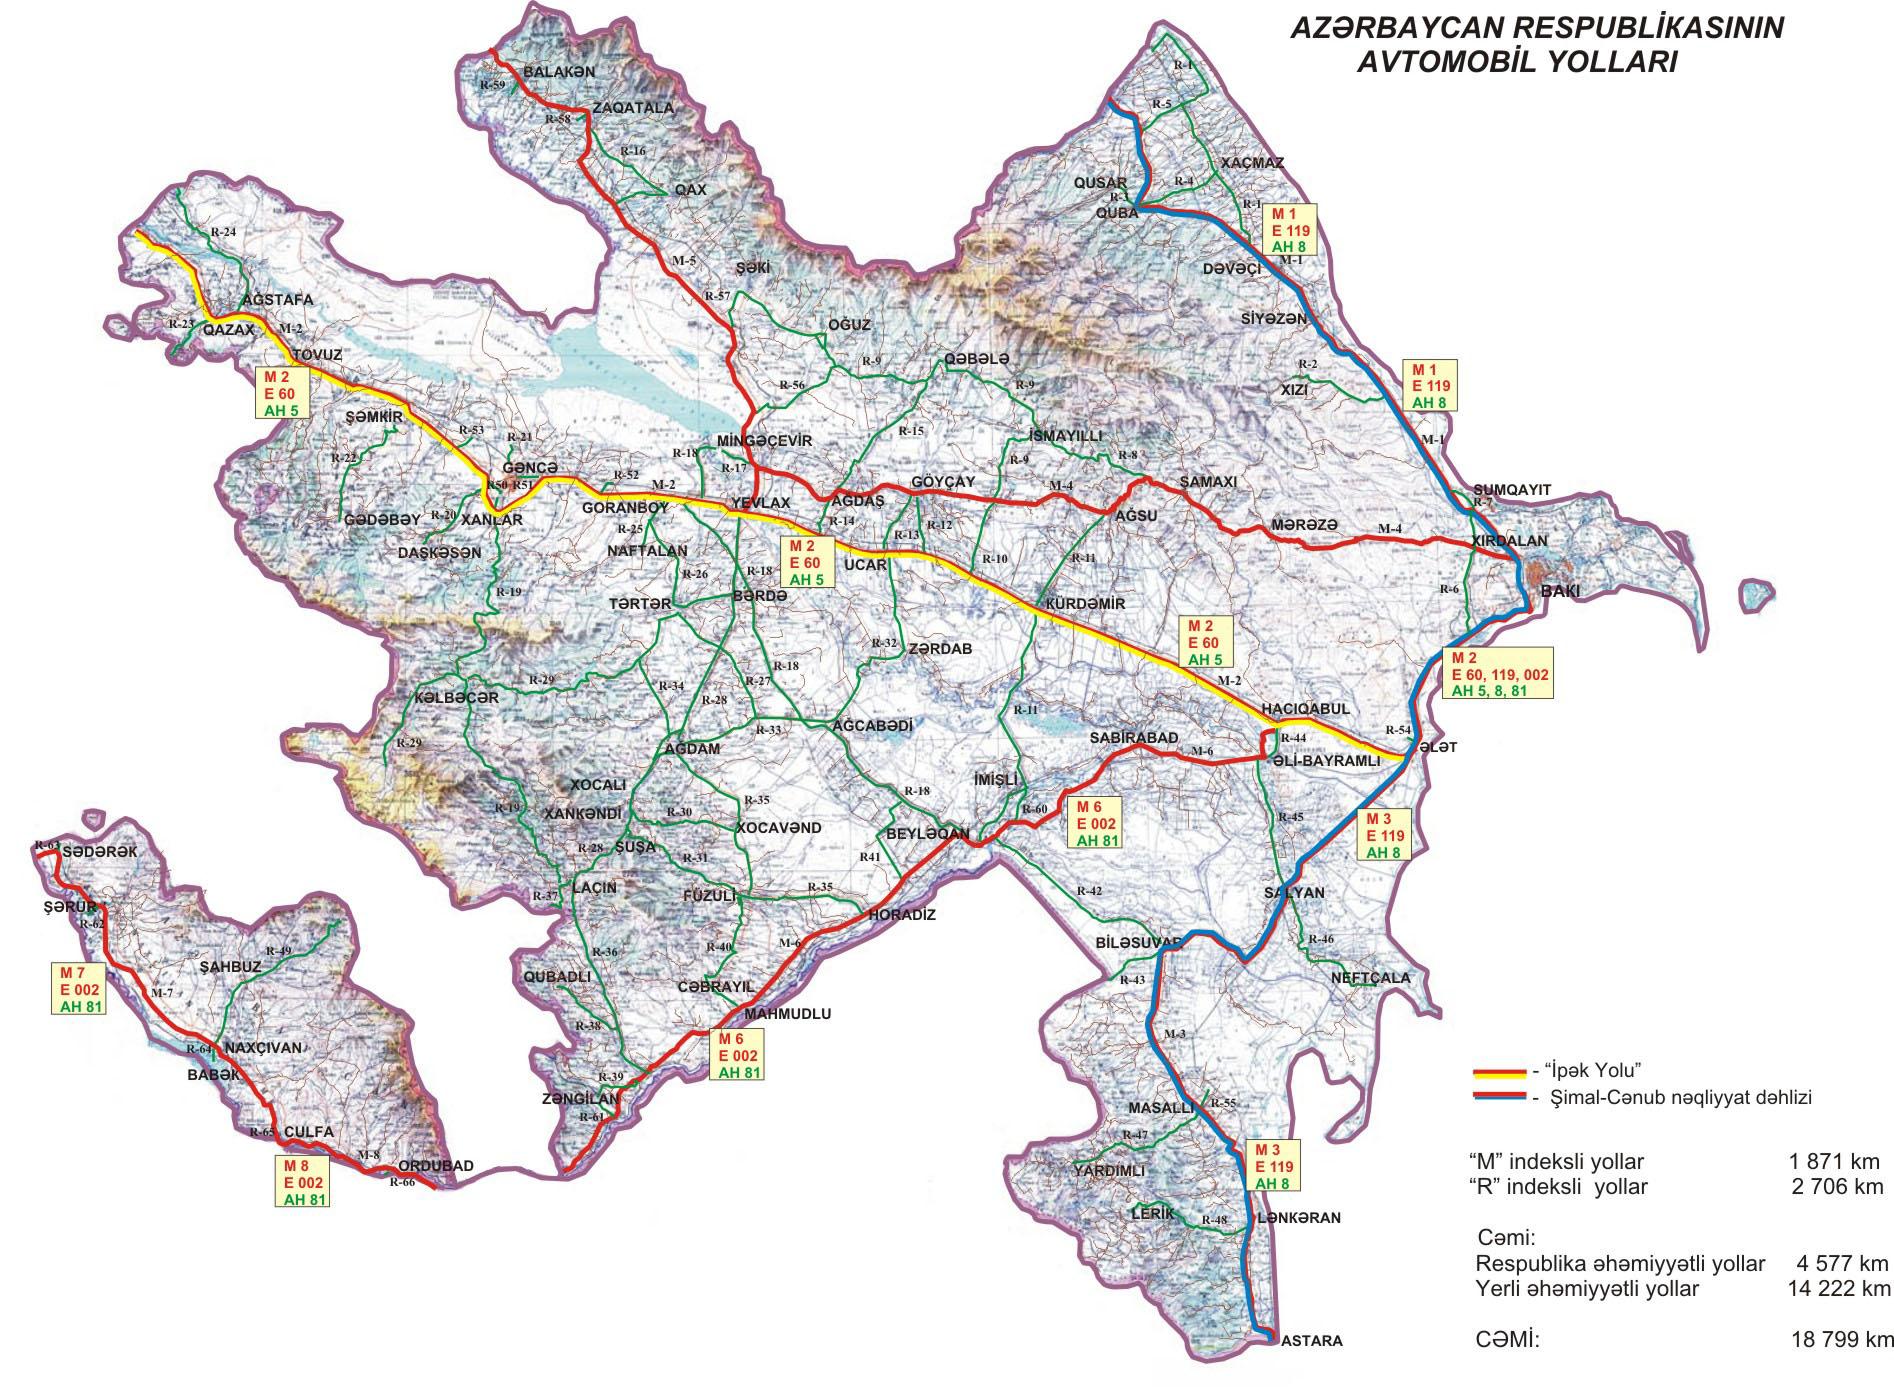 FileAzerbaijan roadsjpg Wikimedia Commons